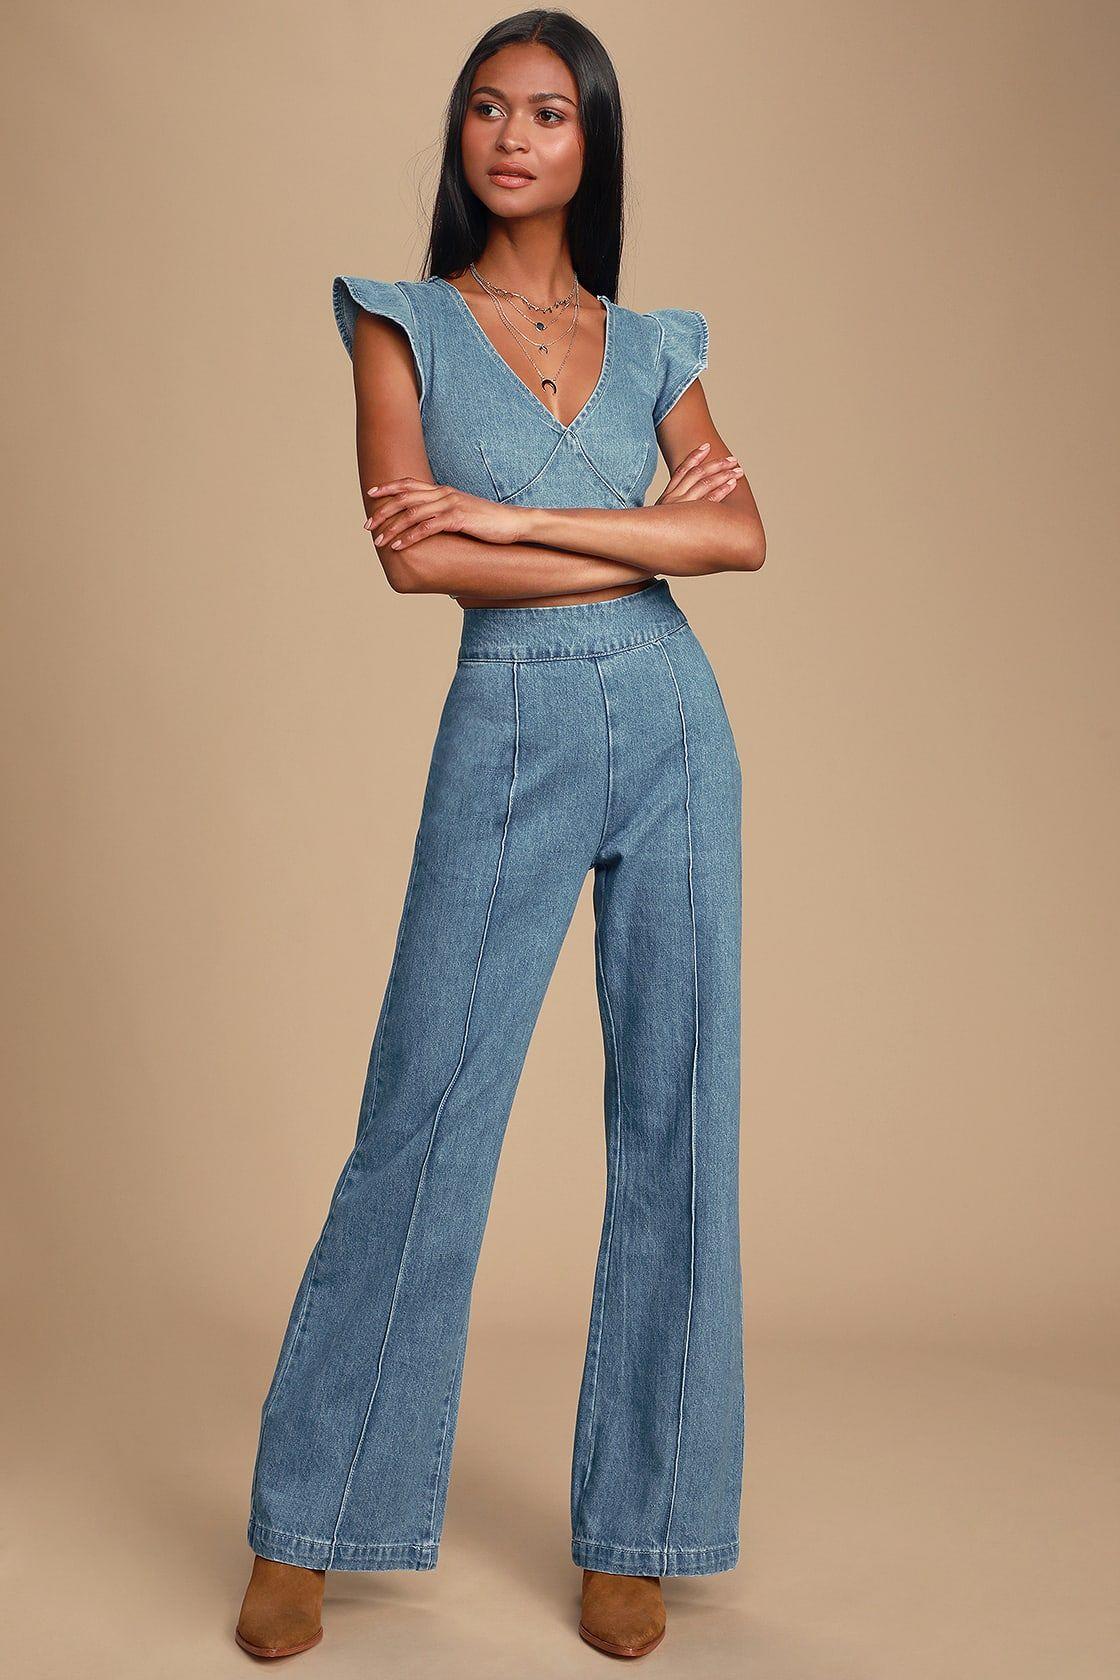 Lyndzee medium wash highwaisted jeans high waist jeans